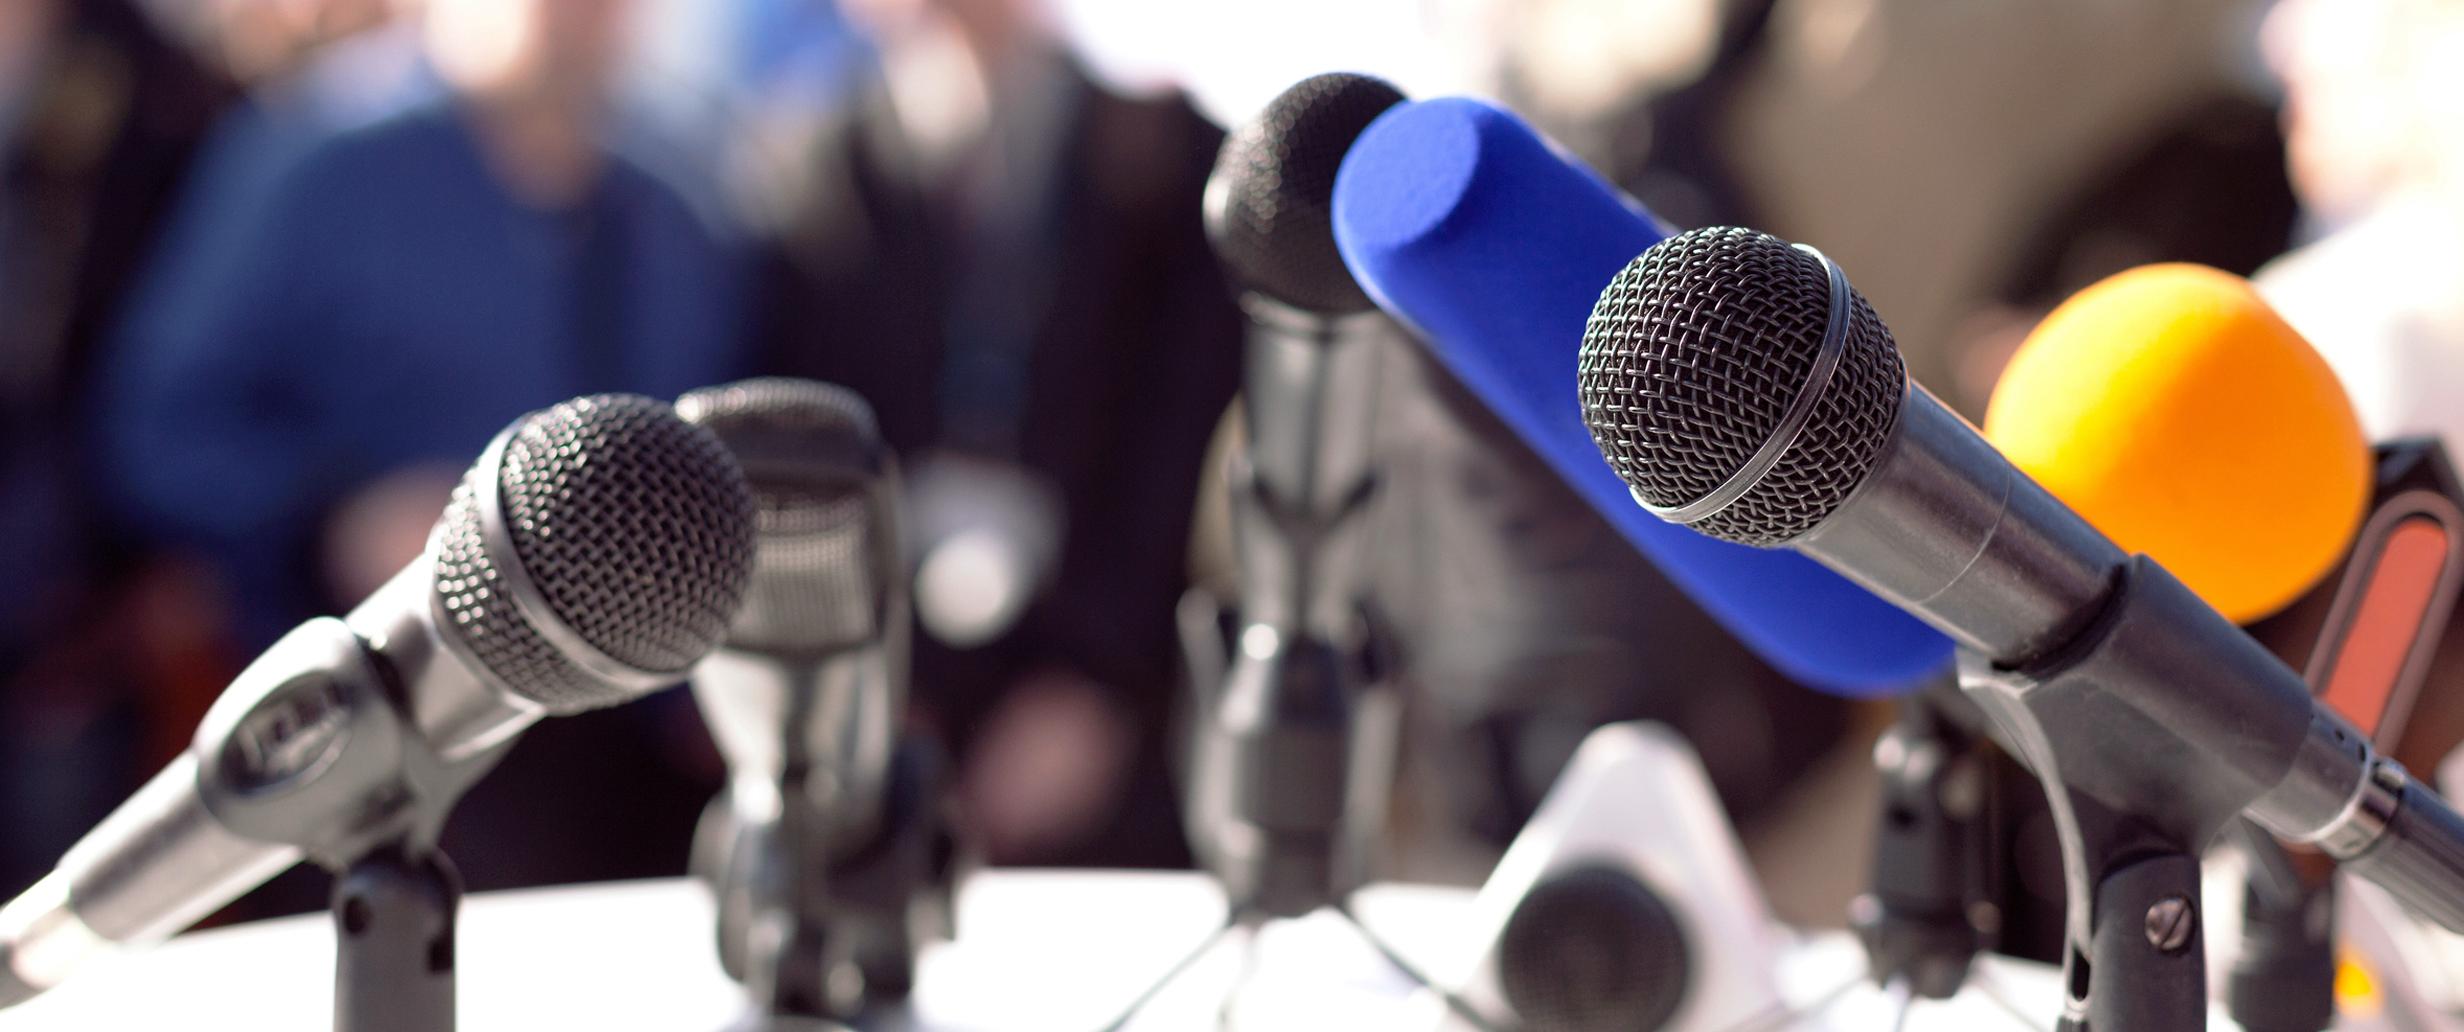 Pressekonferenz © fotolia